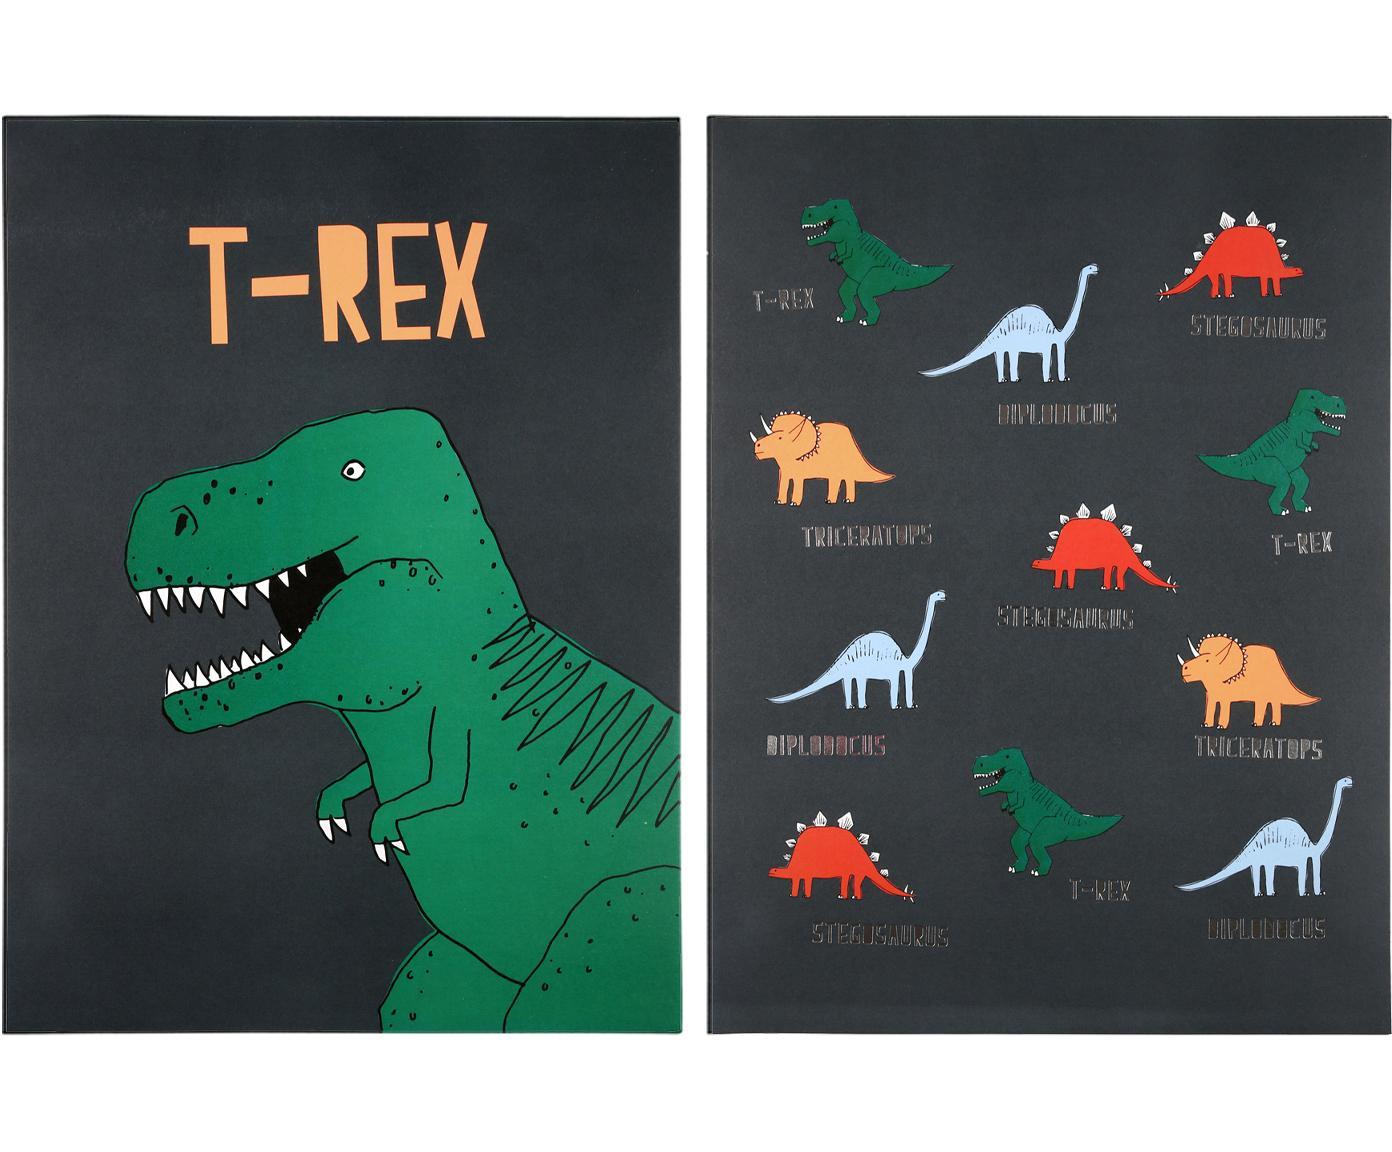 Set di poster Dinosaur, 2 pz., Stampa digitale su carta, 200 g/m², Verde, grigio, giallo, rosso, blu, Larg. 31 x Alt. 41 cm